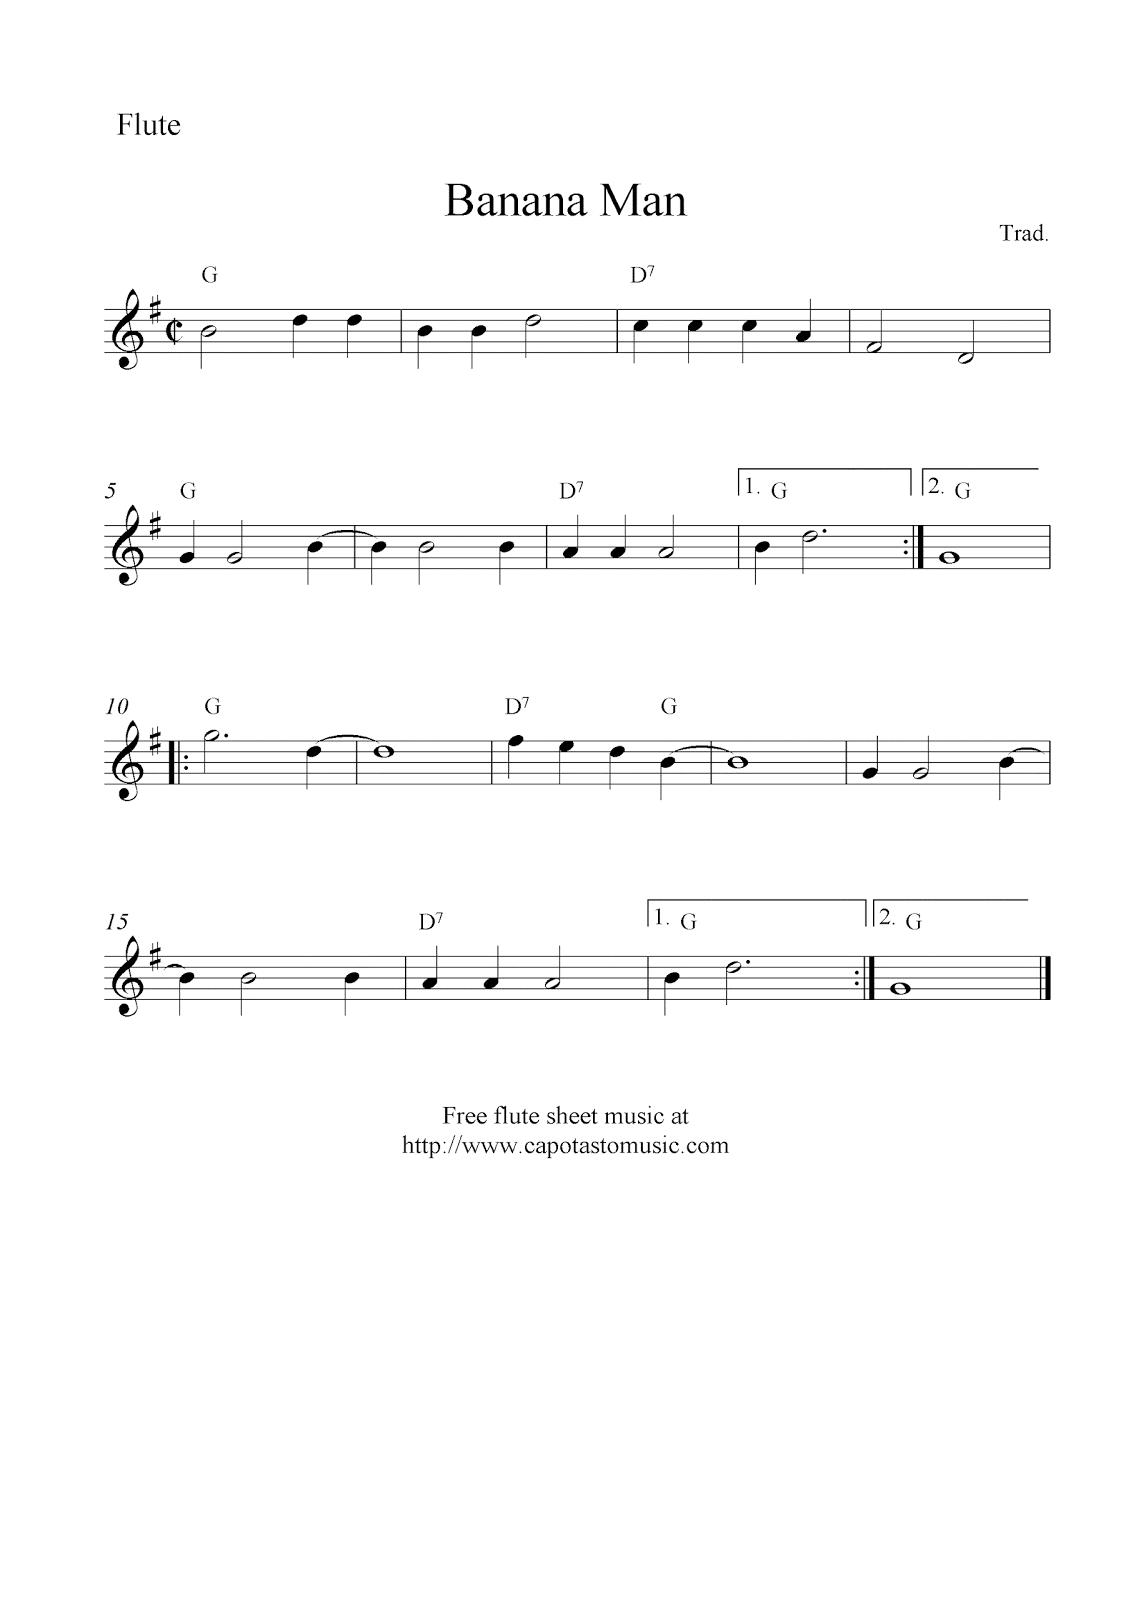 Banana man free flute sheet music notes